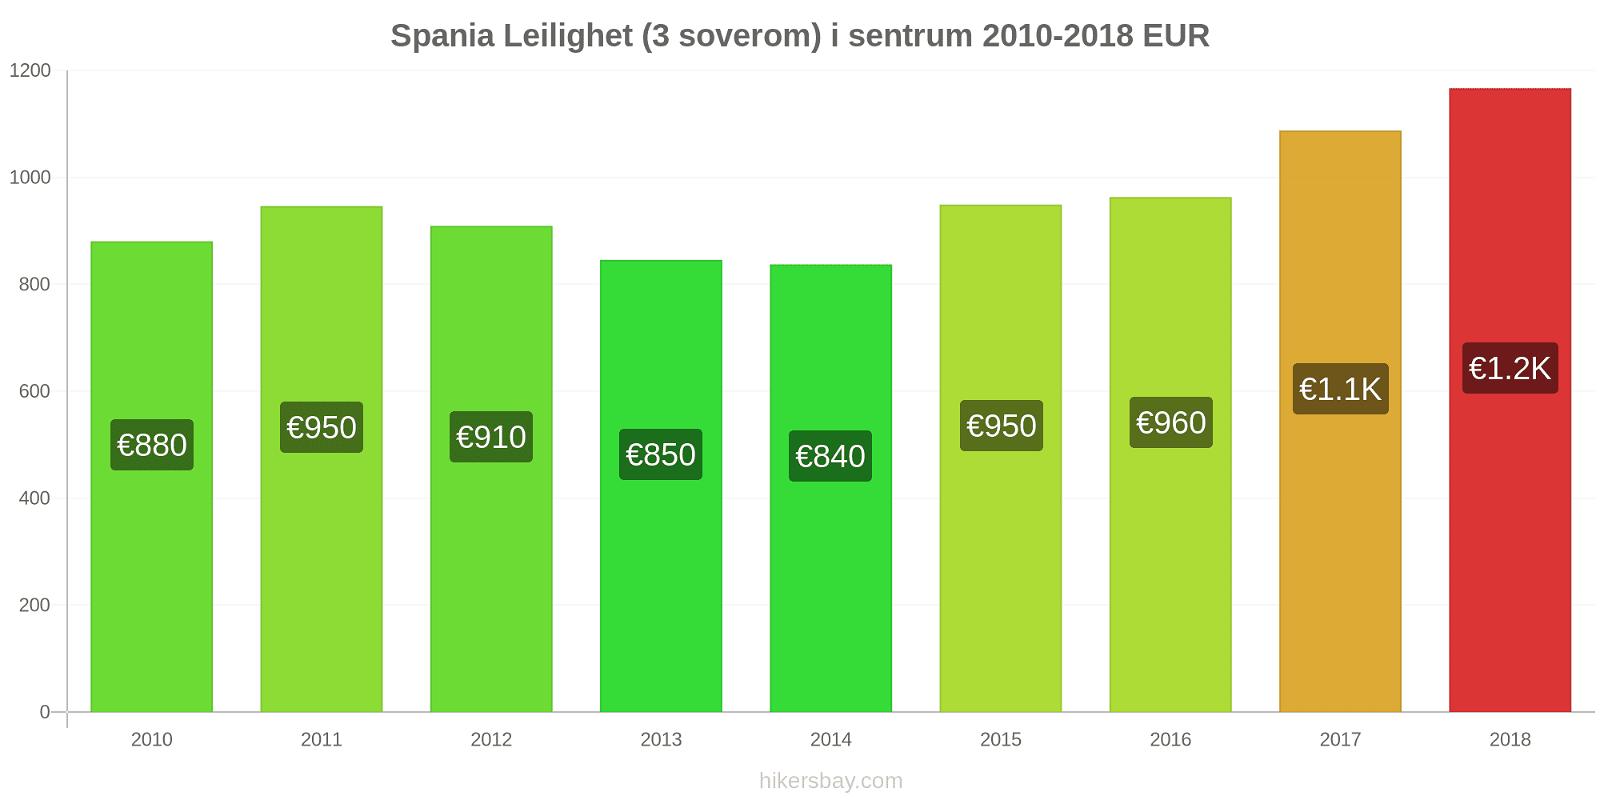 Spania prisendringer Leilighet (3 soverom) i sentrum hikersbay.com